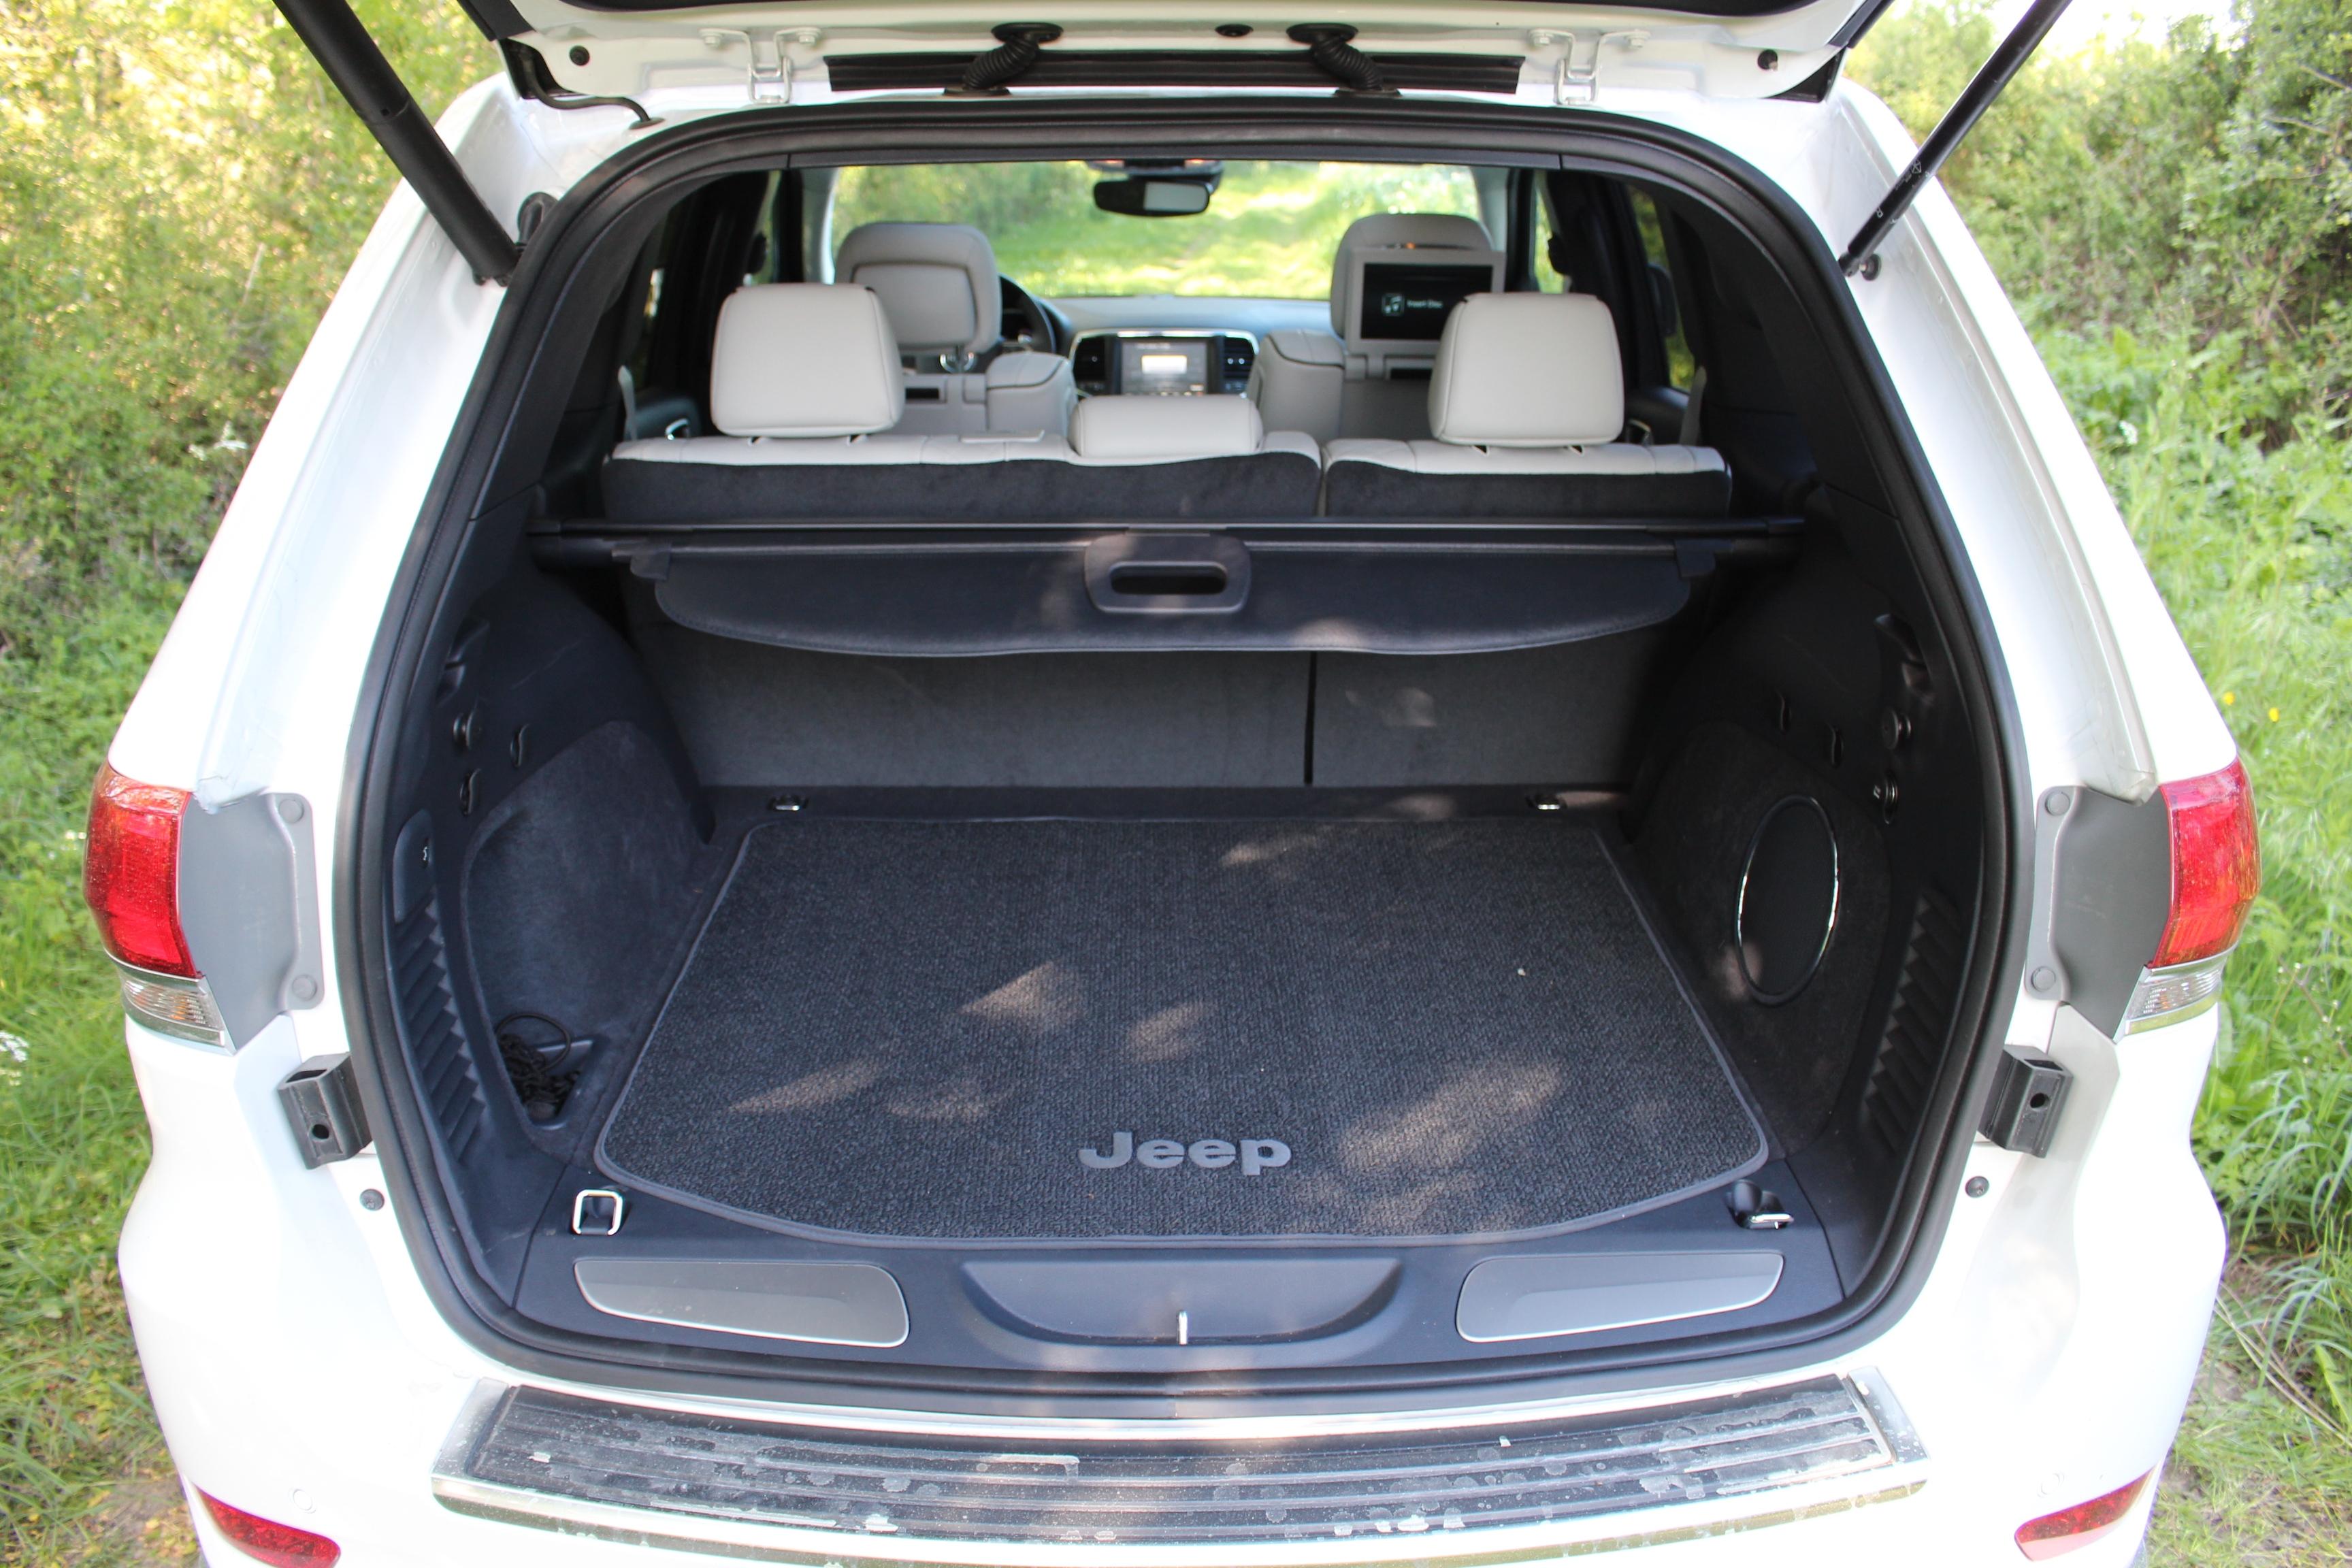 essai vid o jeep grand cherokee 2017 soins palliatifs. Black Bedroom Furniture Sets. Home Design Ideas